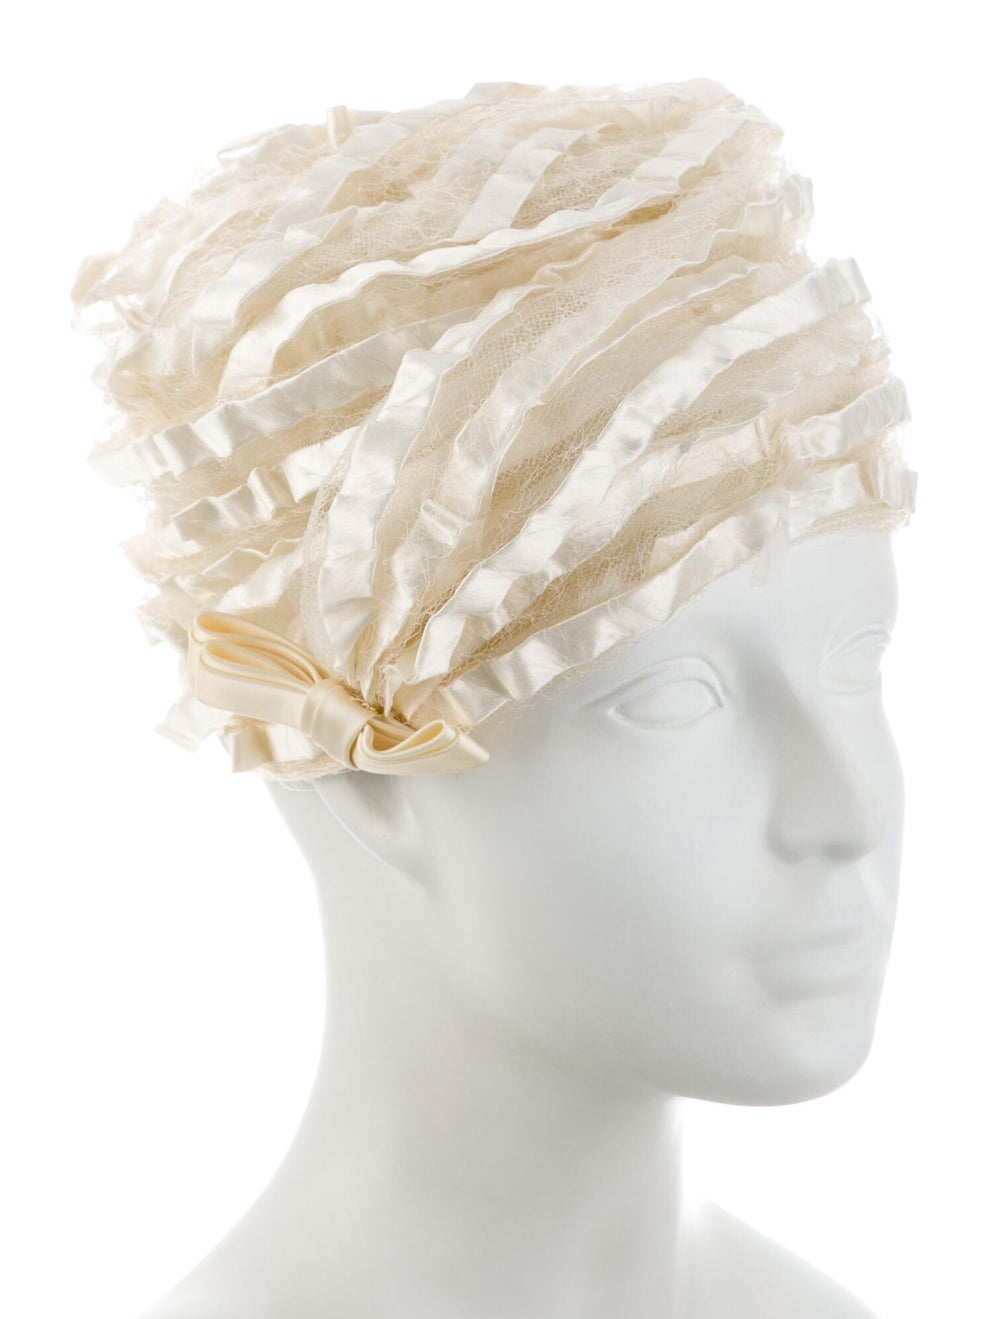 Christian Dior Satin Lace Bucket Hat - image 3